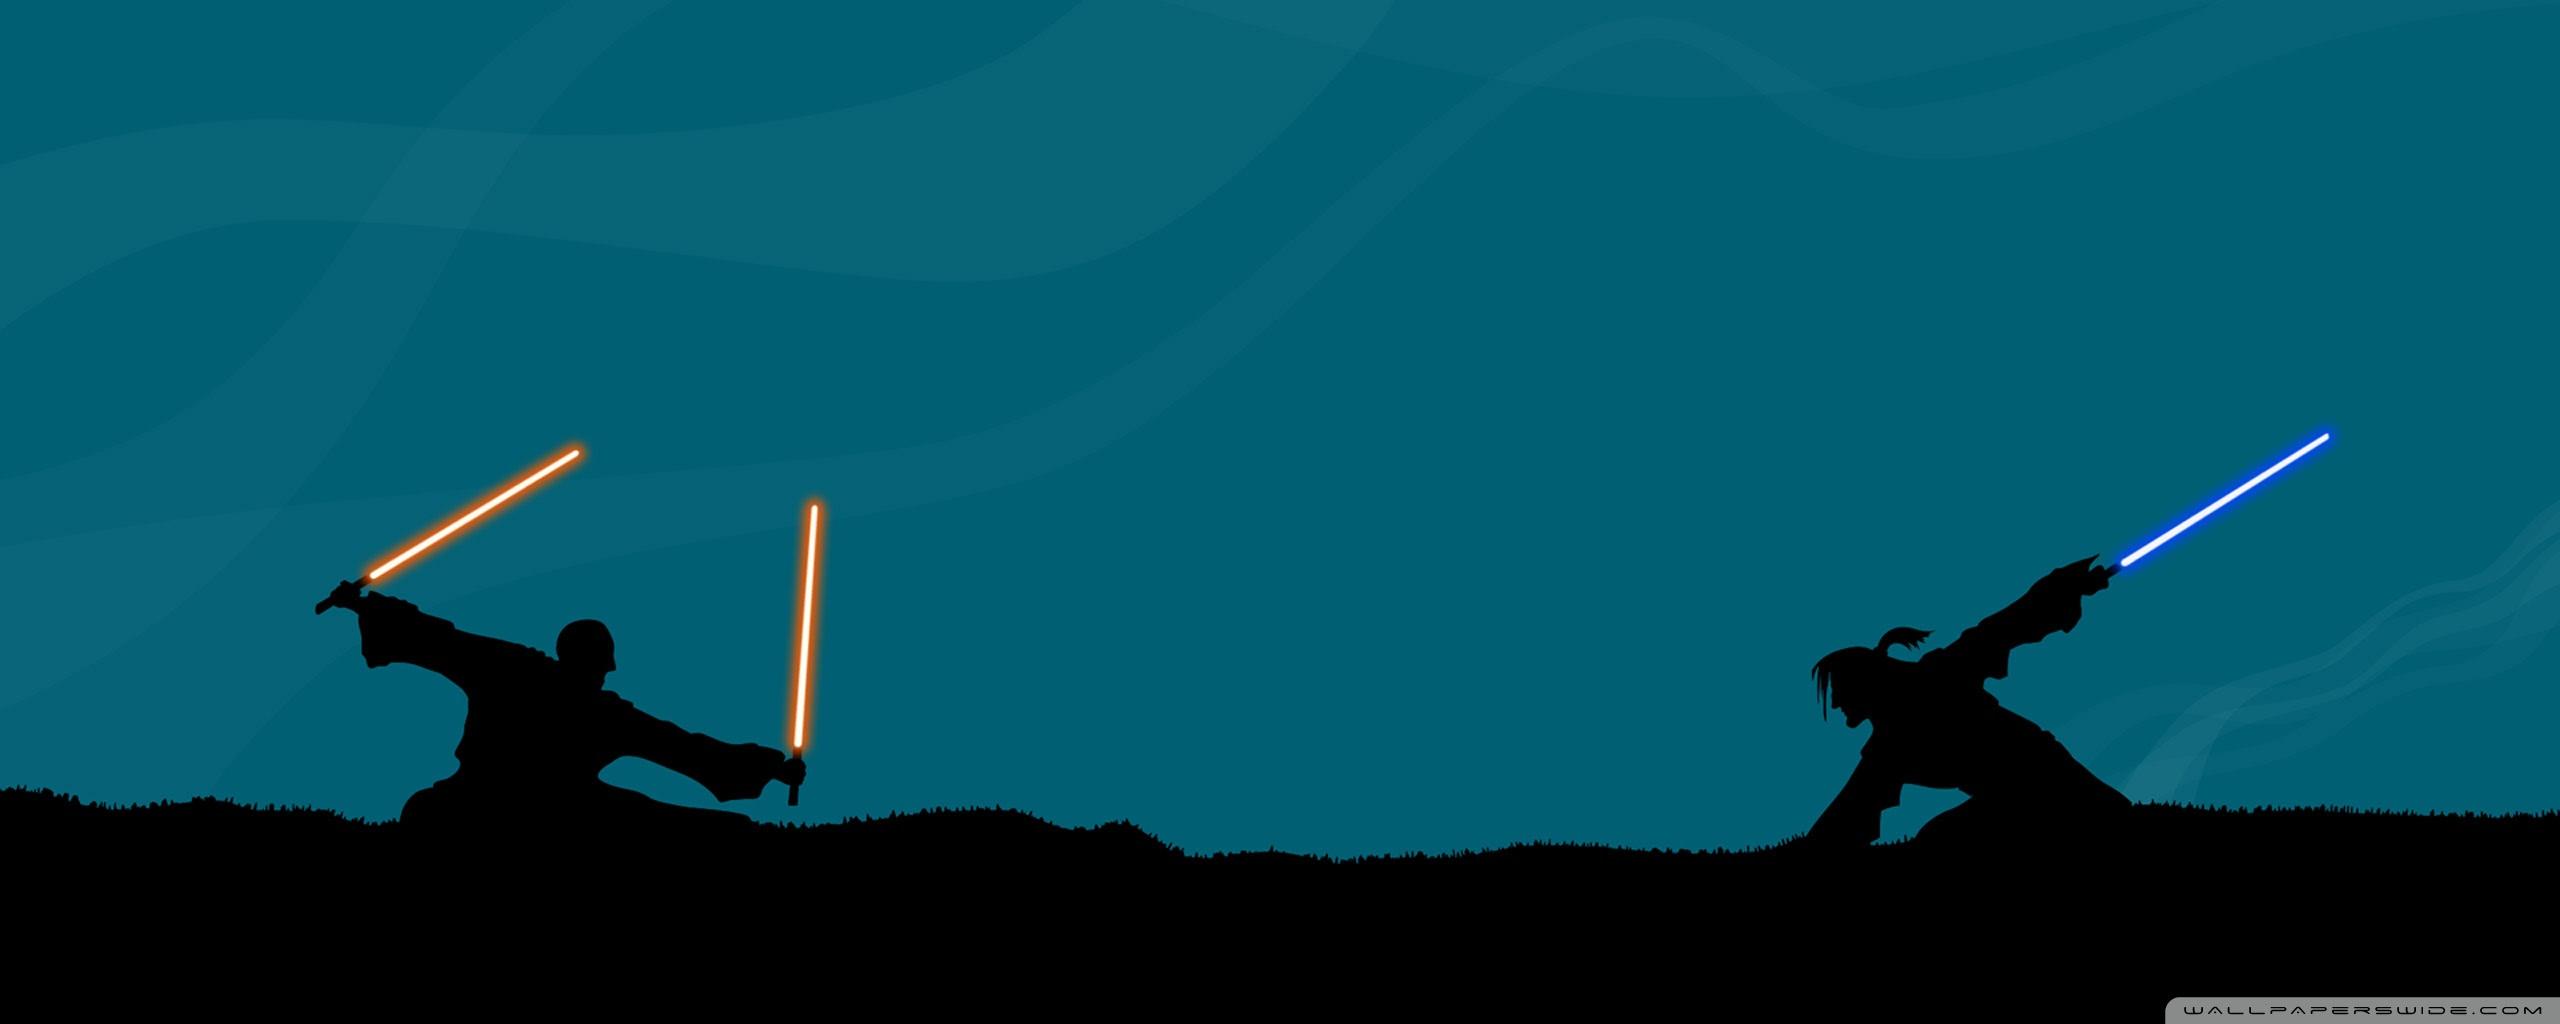 Star Wars Lightsaber Fight Ultra Hd Desktop Background Wallpaper